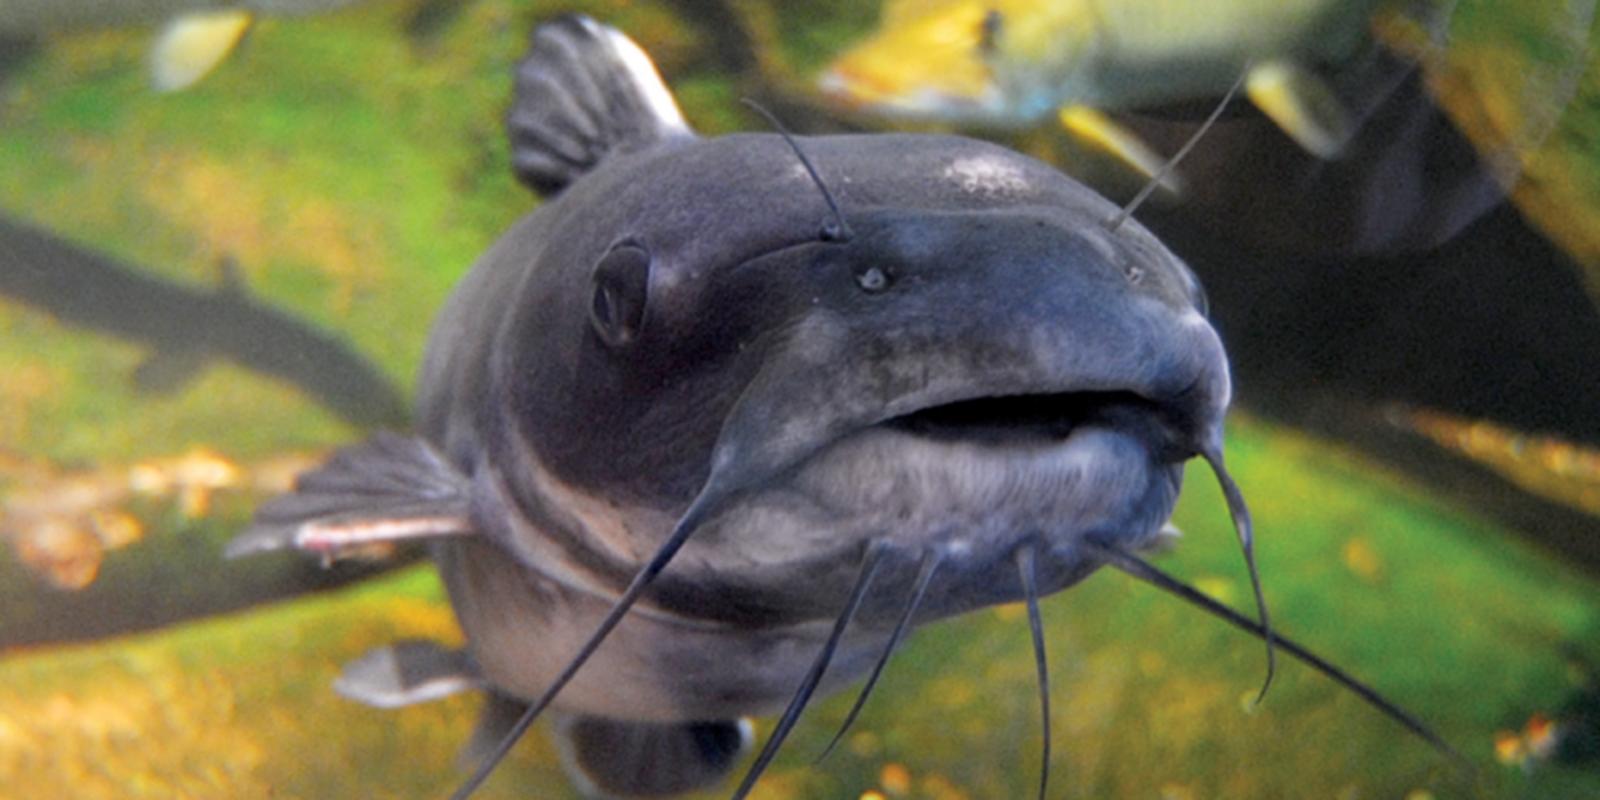 Catfish at Great Lakes Aquarium